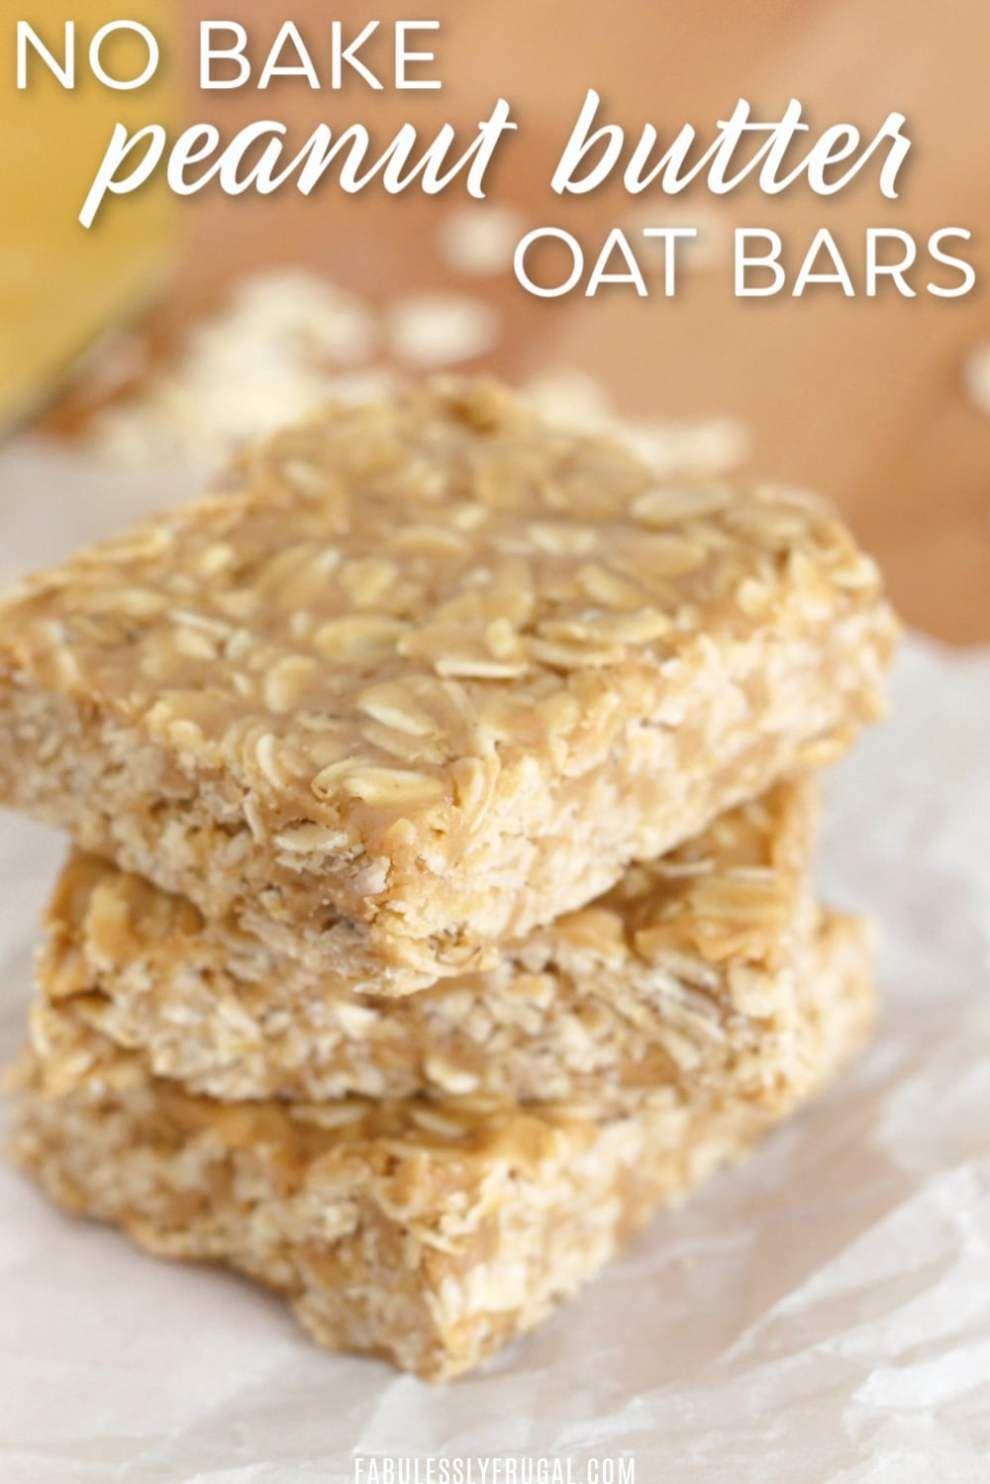 Healthy No Bake Peanut Butter Oat Bars Recipe Fabulessly Frugal Recipe Oat Bar Recipes Peanut Butter Recipes Peanut Butter Oat Bars